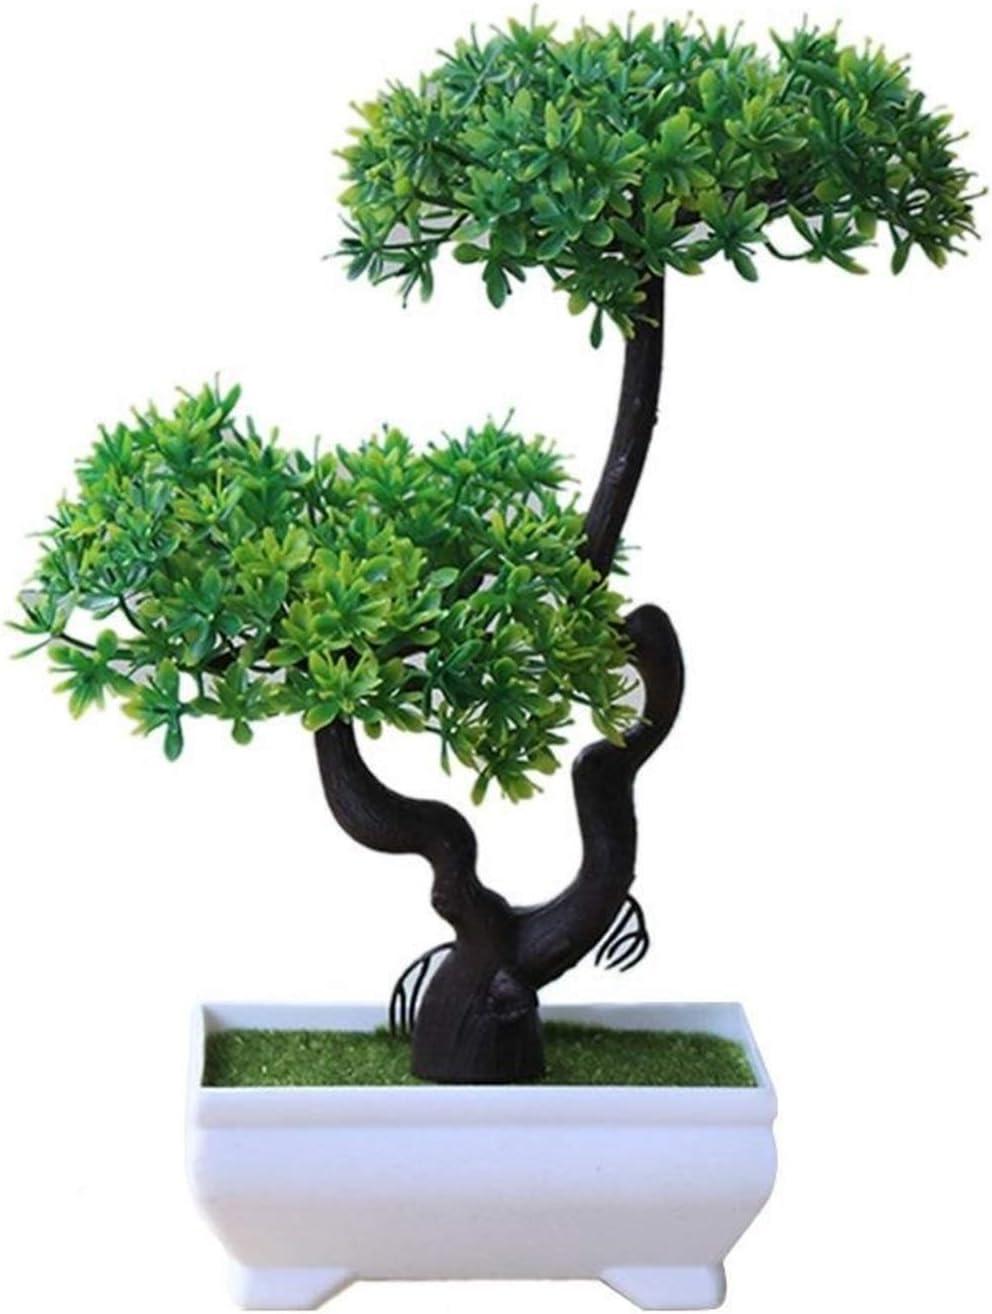 xuejuanshop Fake Plants Al Max 59% OFF sold out. Artificial Tree Plant Bonsai Potted